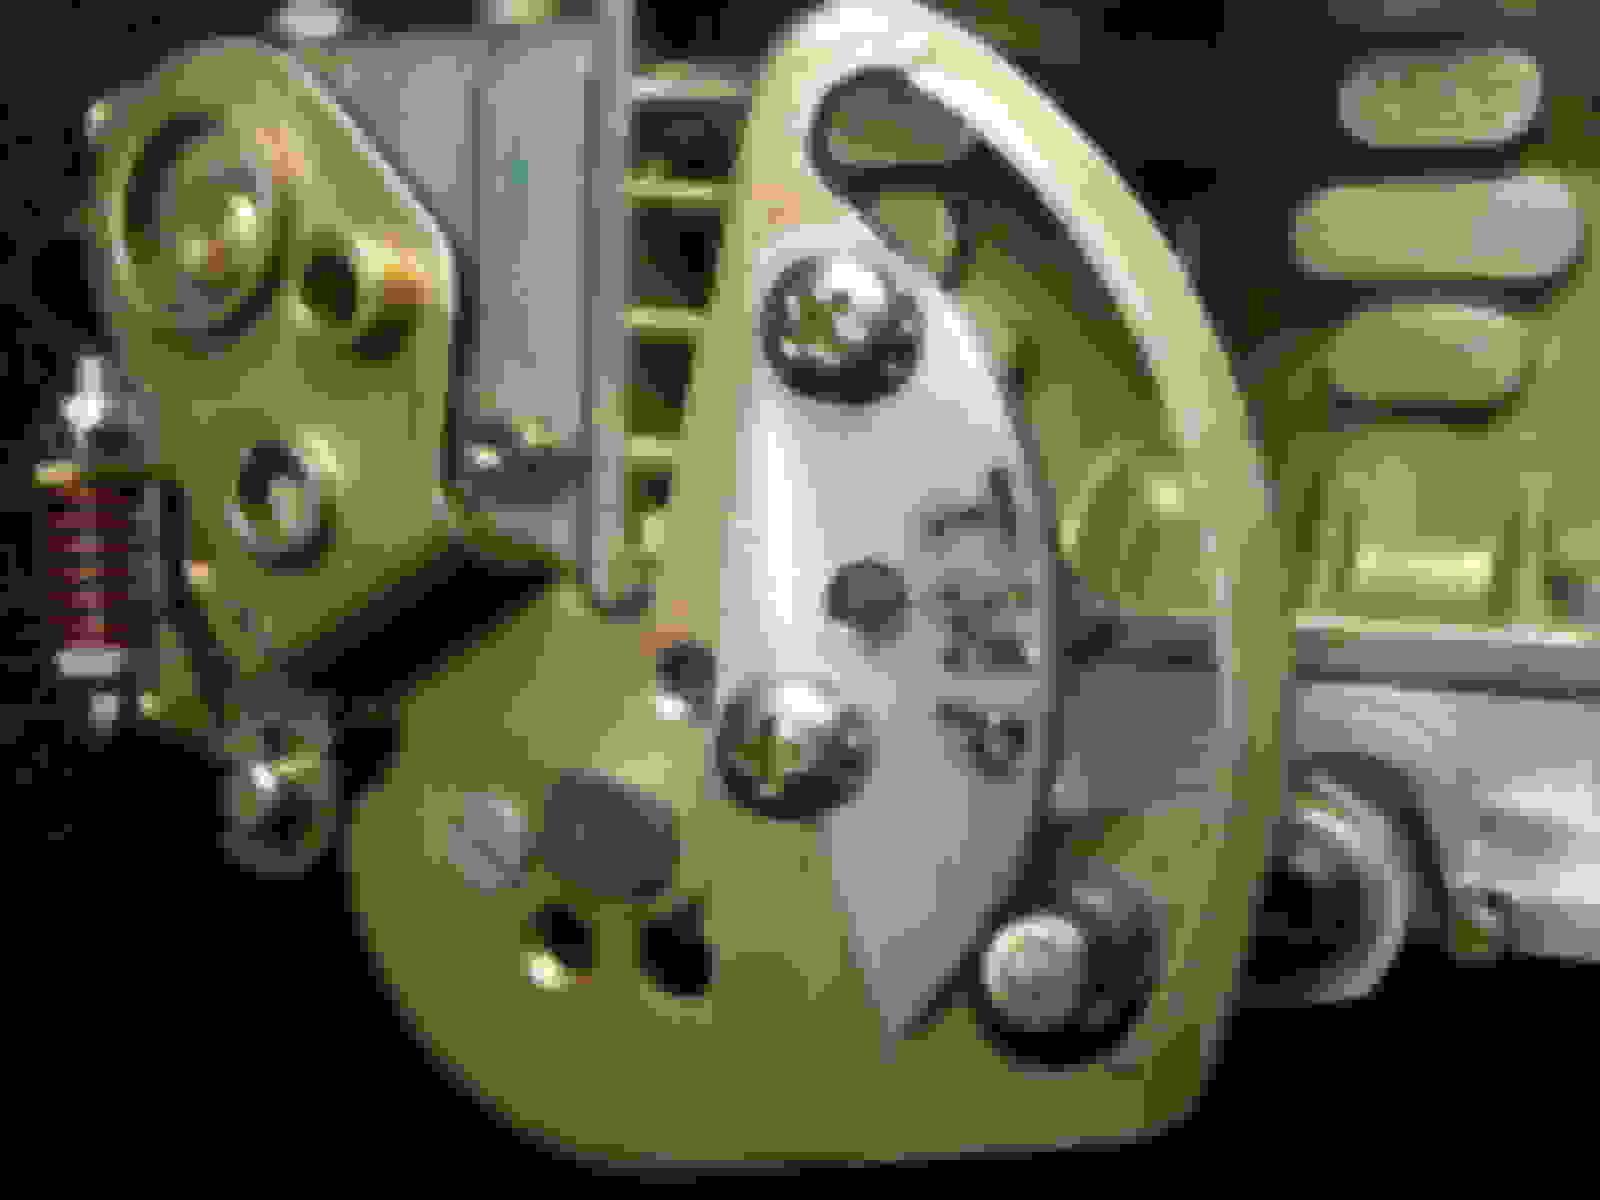 F A S T  EFI 4bbl throttle body and haltech on 12a - RX7Club com